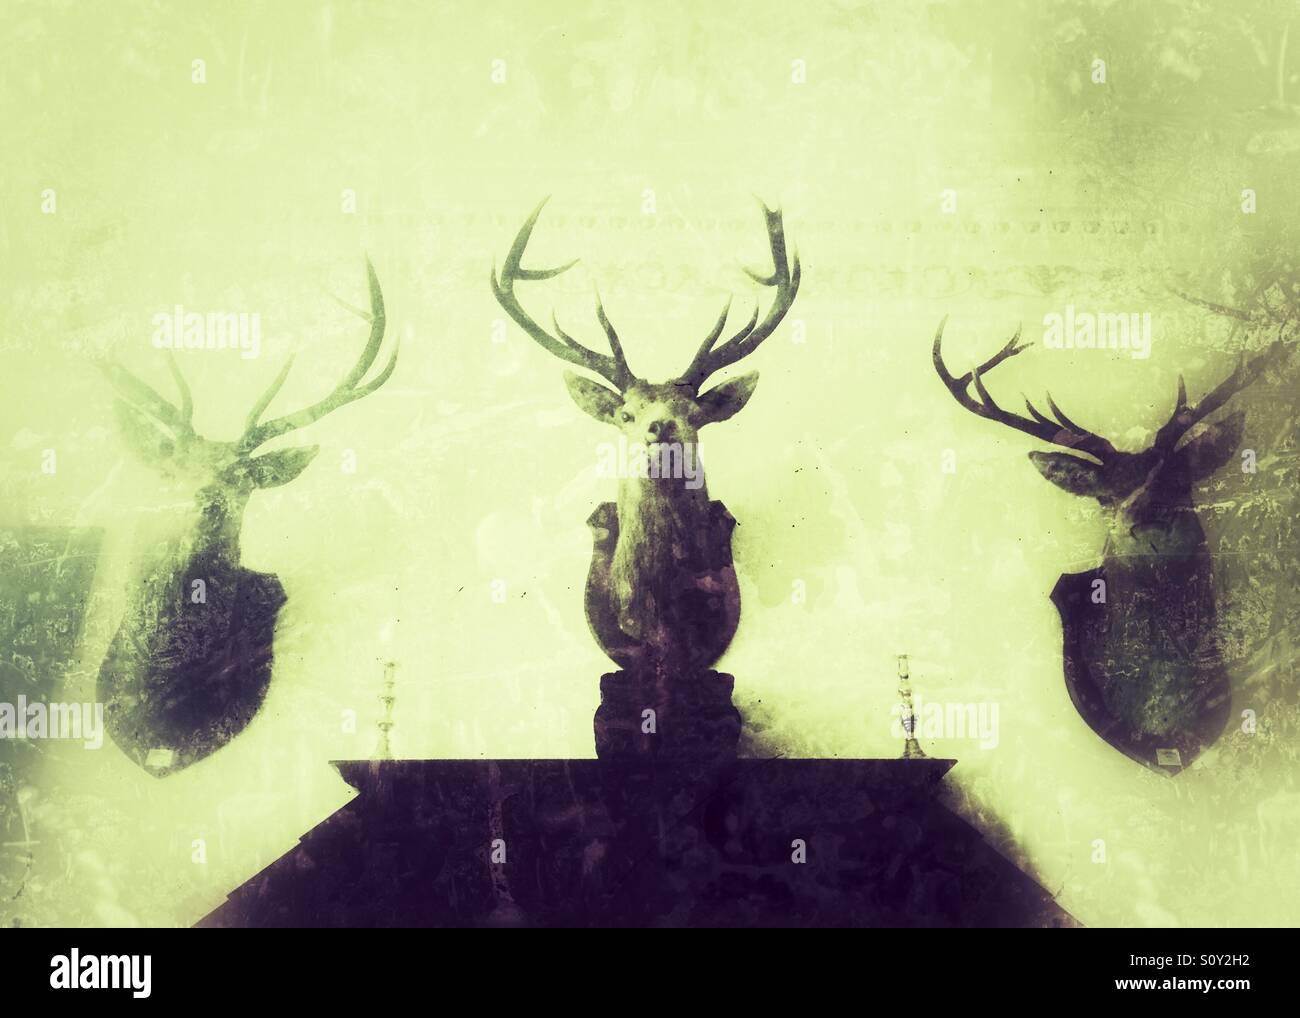 Deer Heads Stock Photos & Deer Heads Stock Images - Alamy